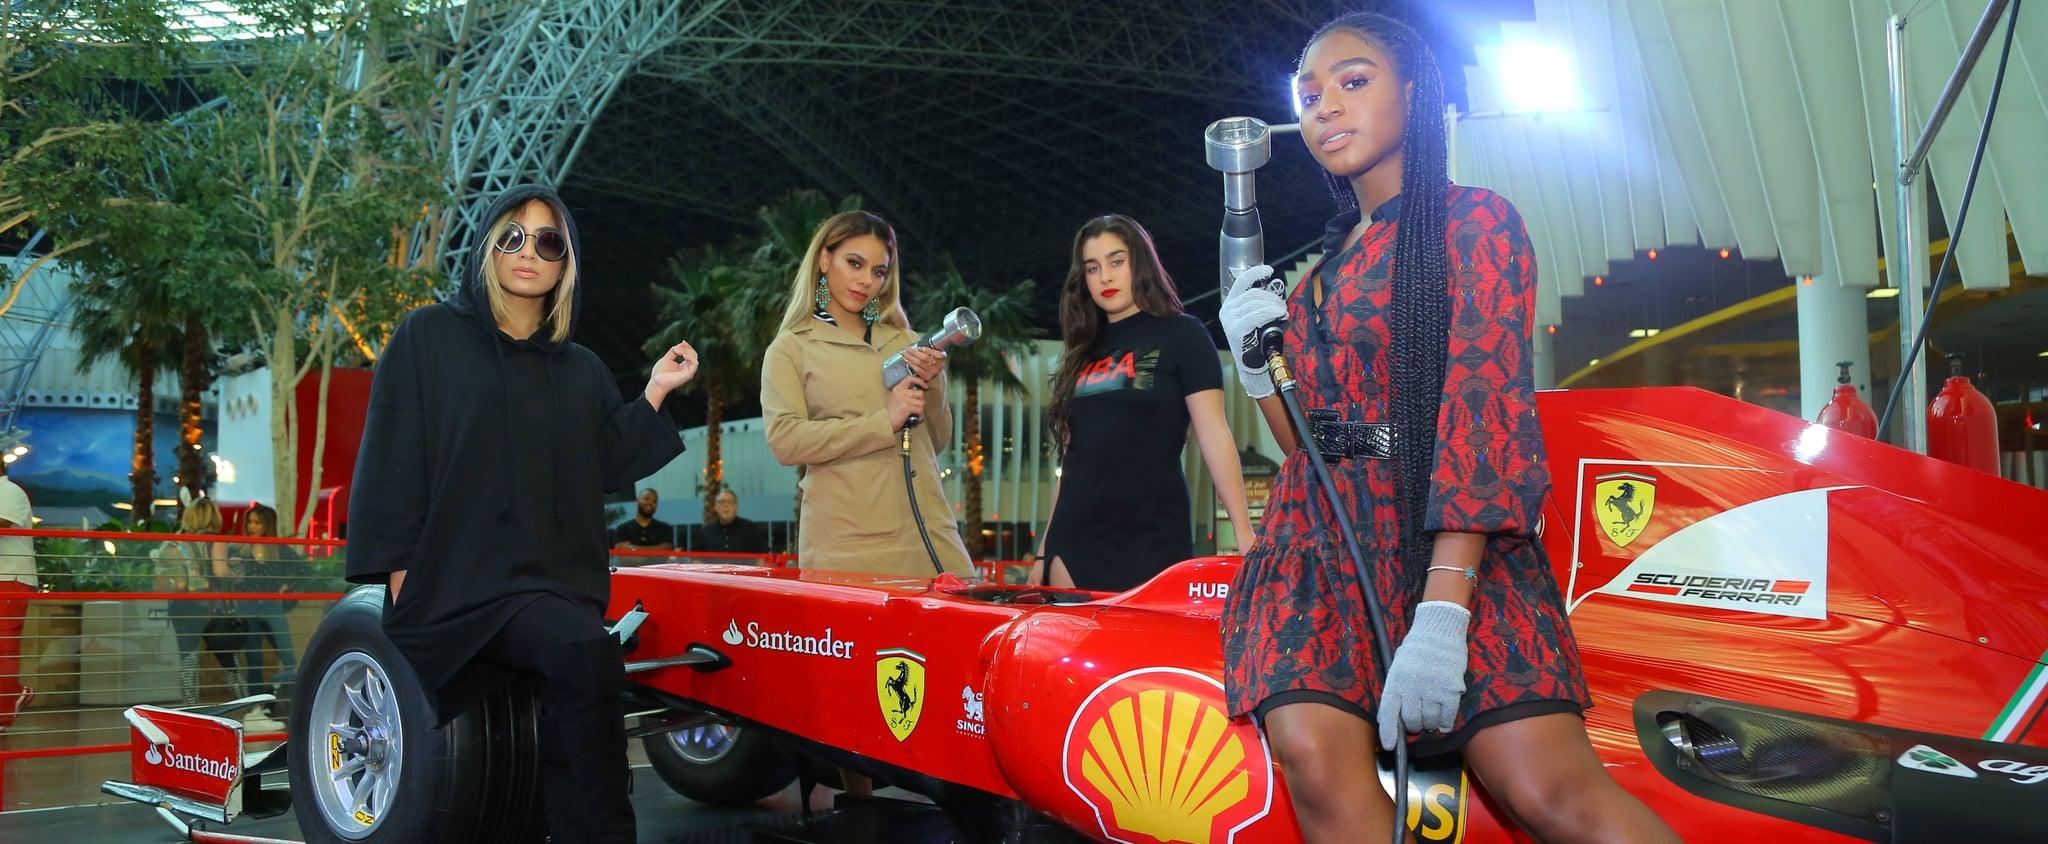 "Fifth Harmony Basically Recreated Their ""Work From Home"" Music Video at Ferrari World Abu Dhabi"